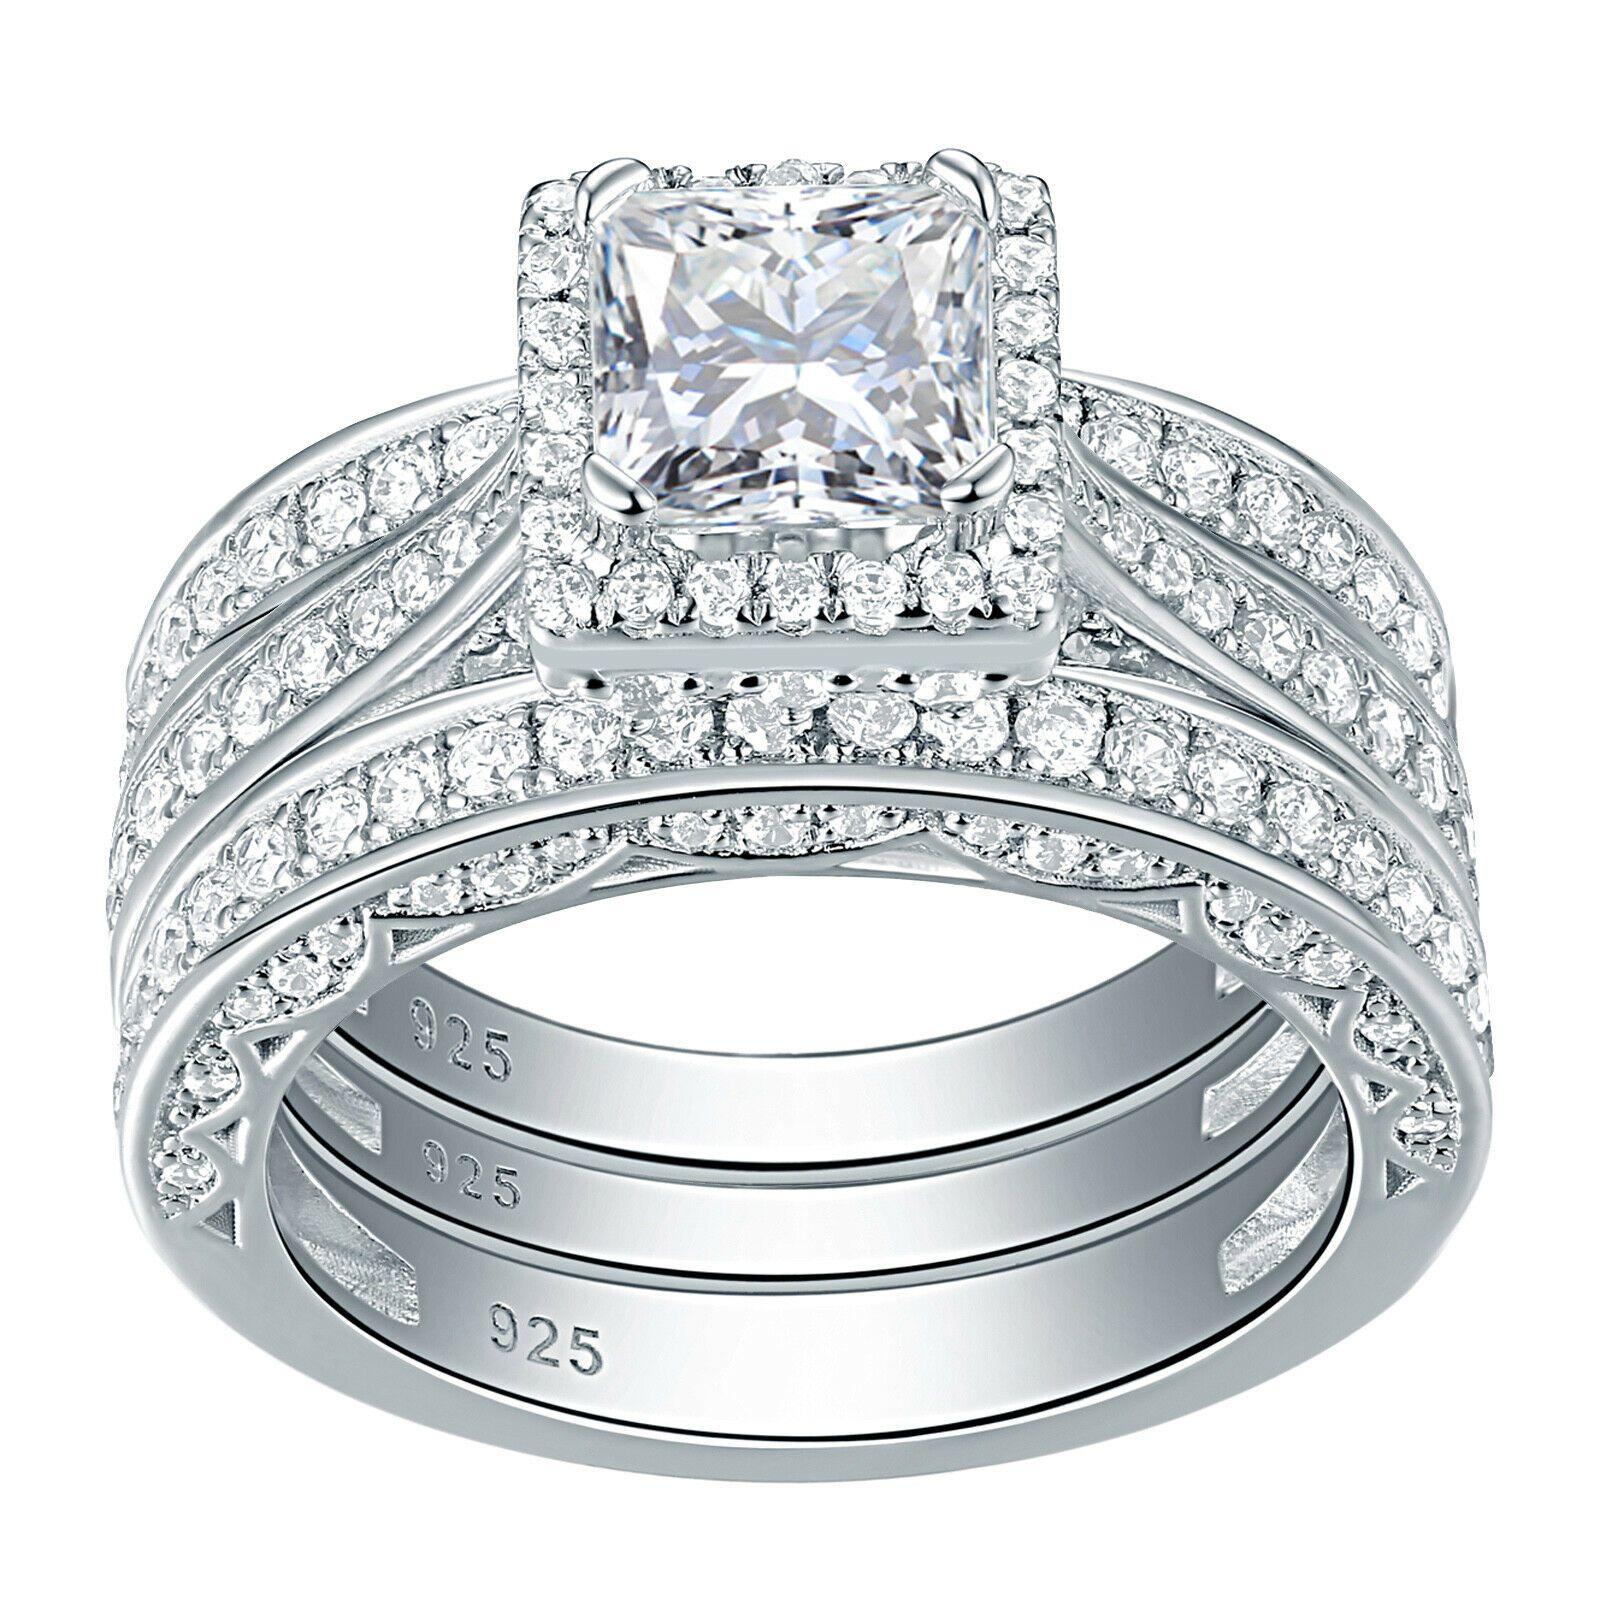 3 05 Tcw Cz 925 Sterling Silver 3 Piece Bridal Ring Set Wedding Ring Set In 2020 Wedding Ring Sets Sterling Silver Wedding Rings Sets Sterling Silver Wedding Sets